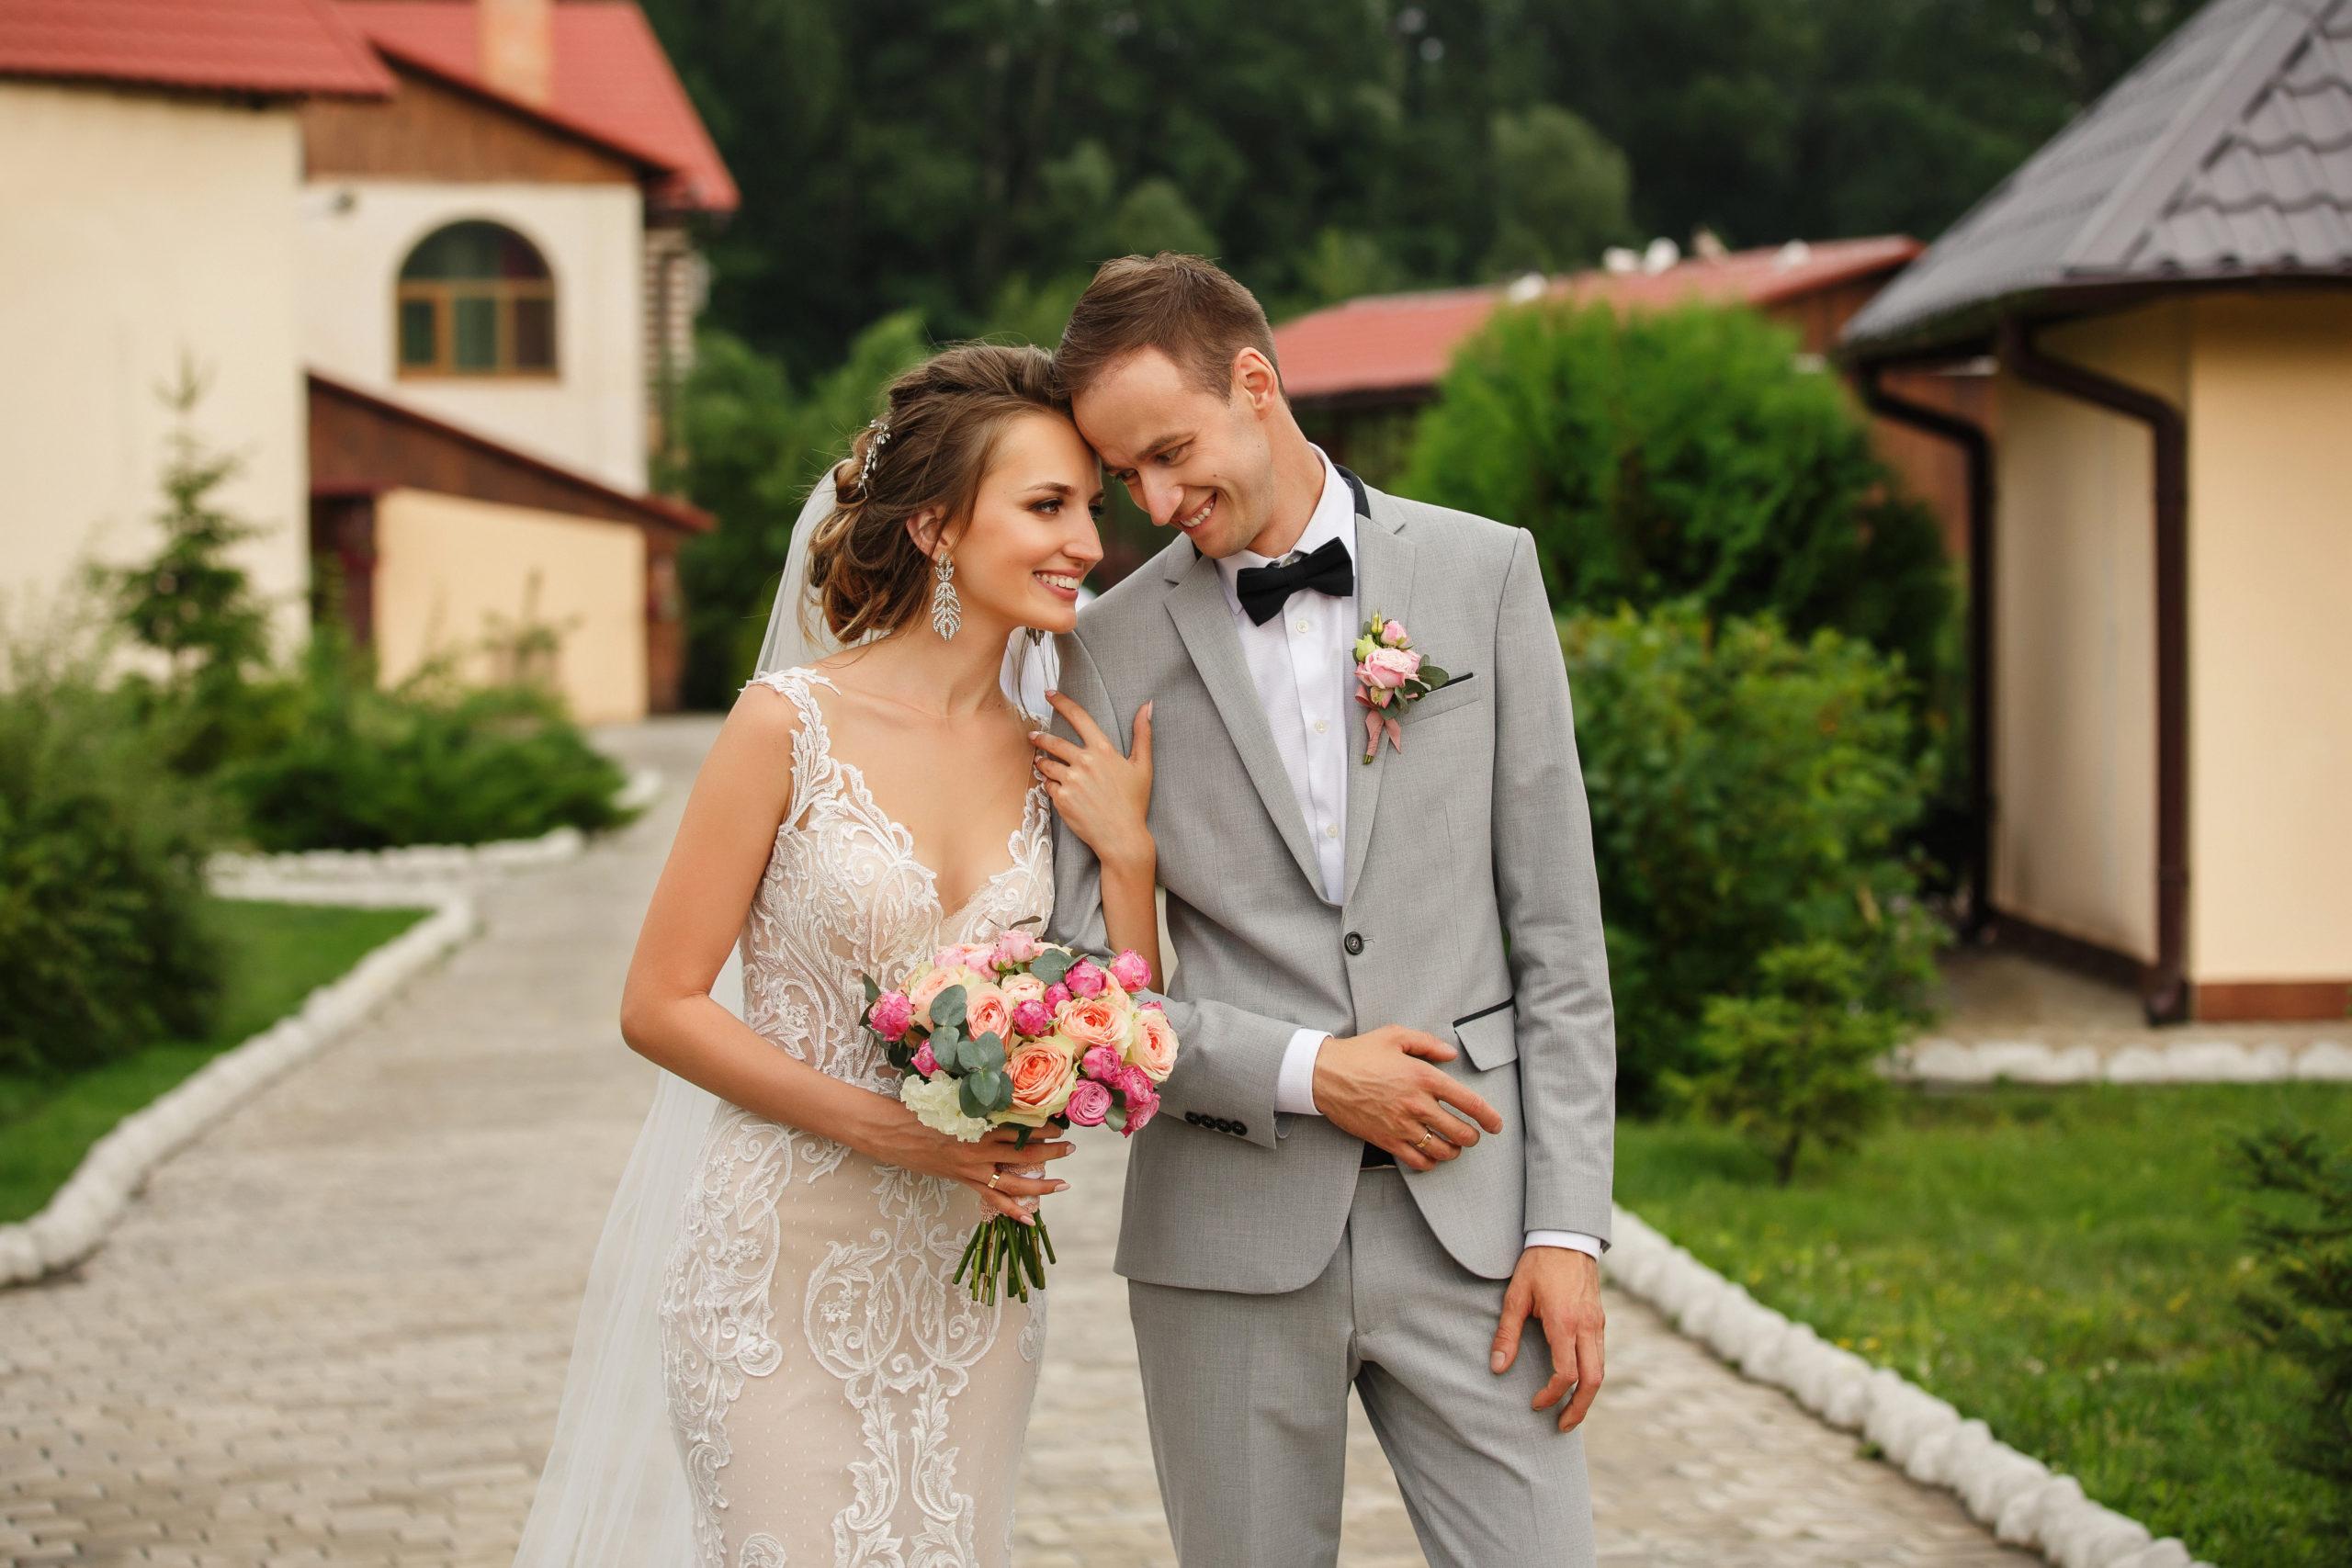 wedding-couple-happy-bride-bouquet-holds-1207000795